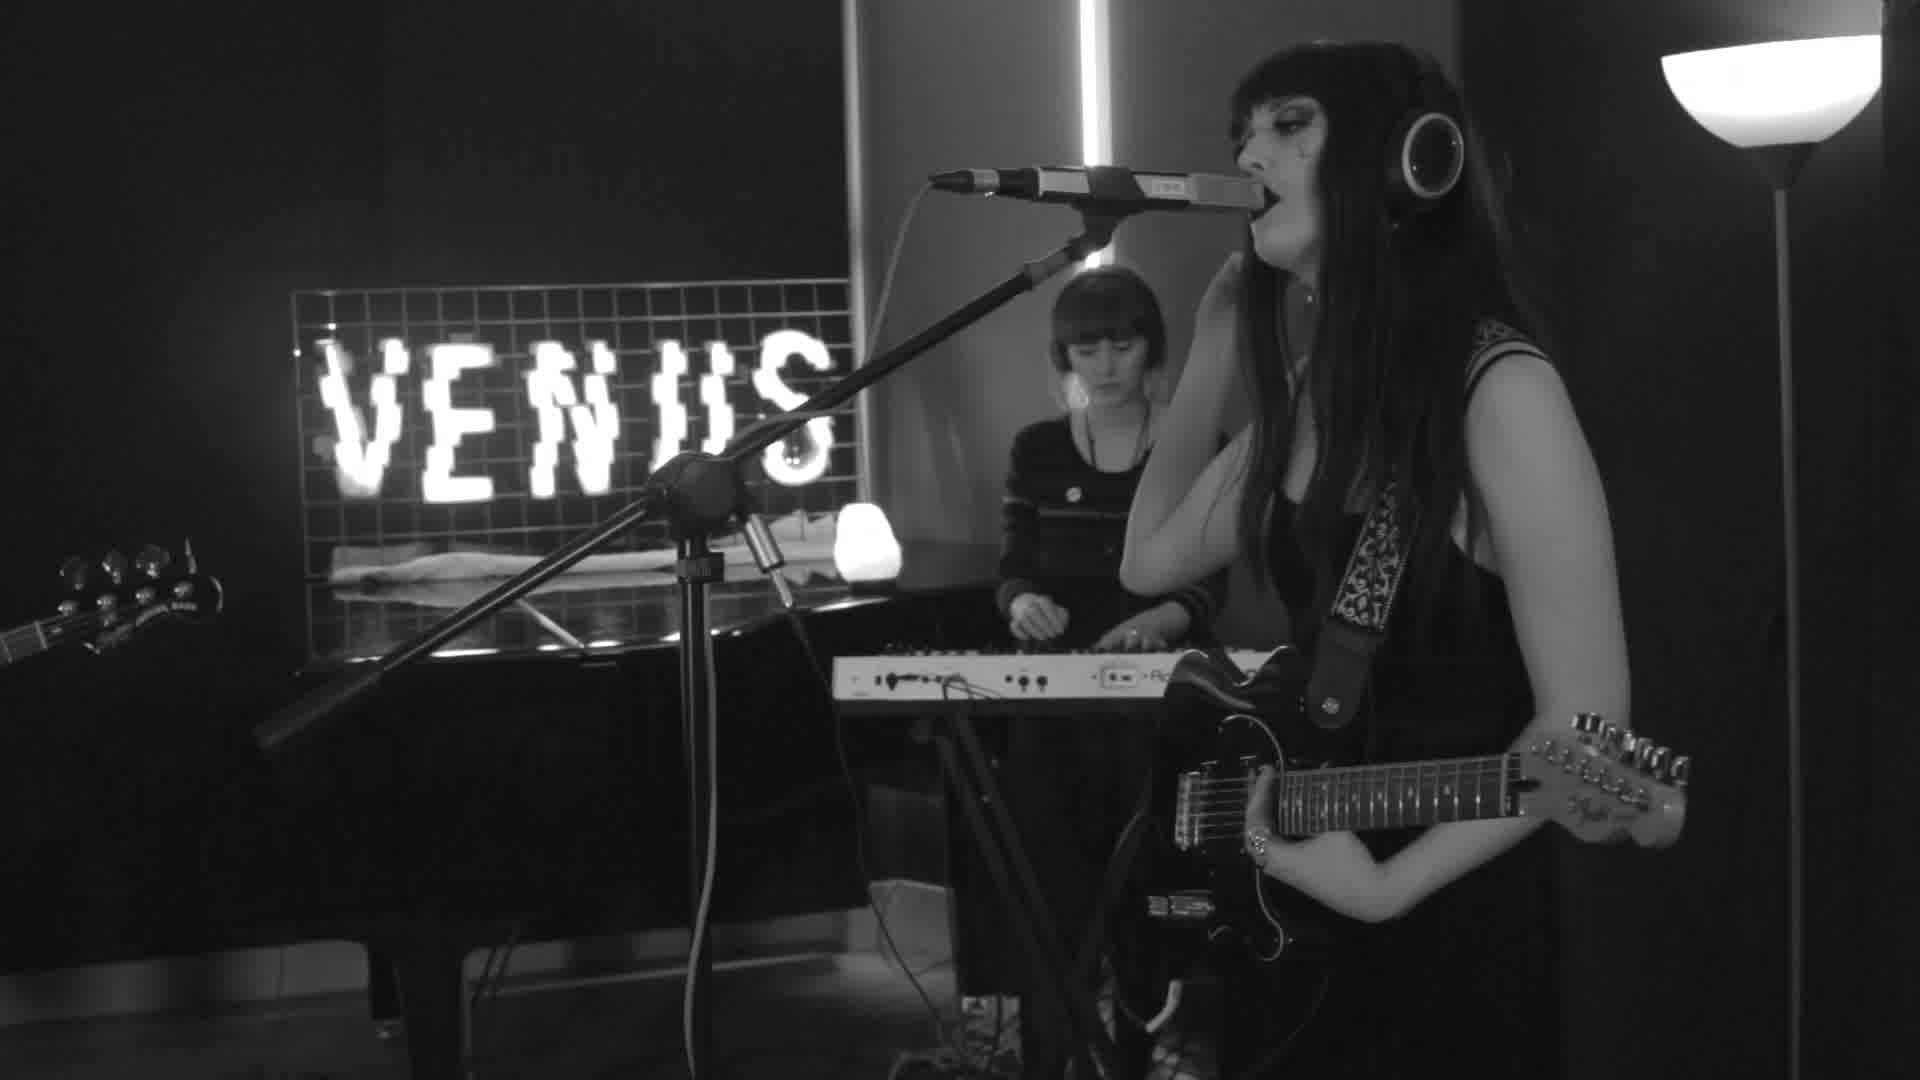 Live From Studio 3 featuring VENUS